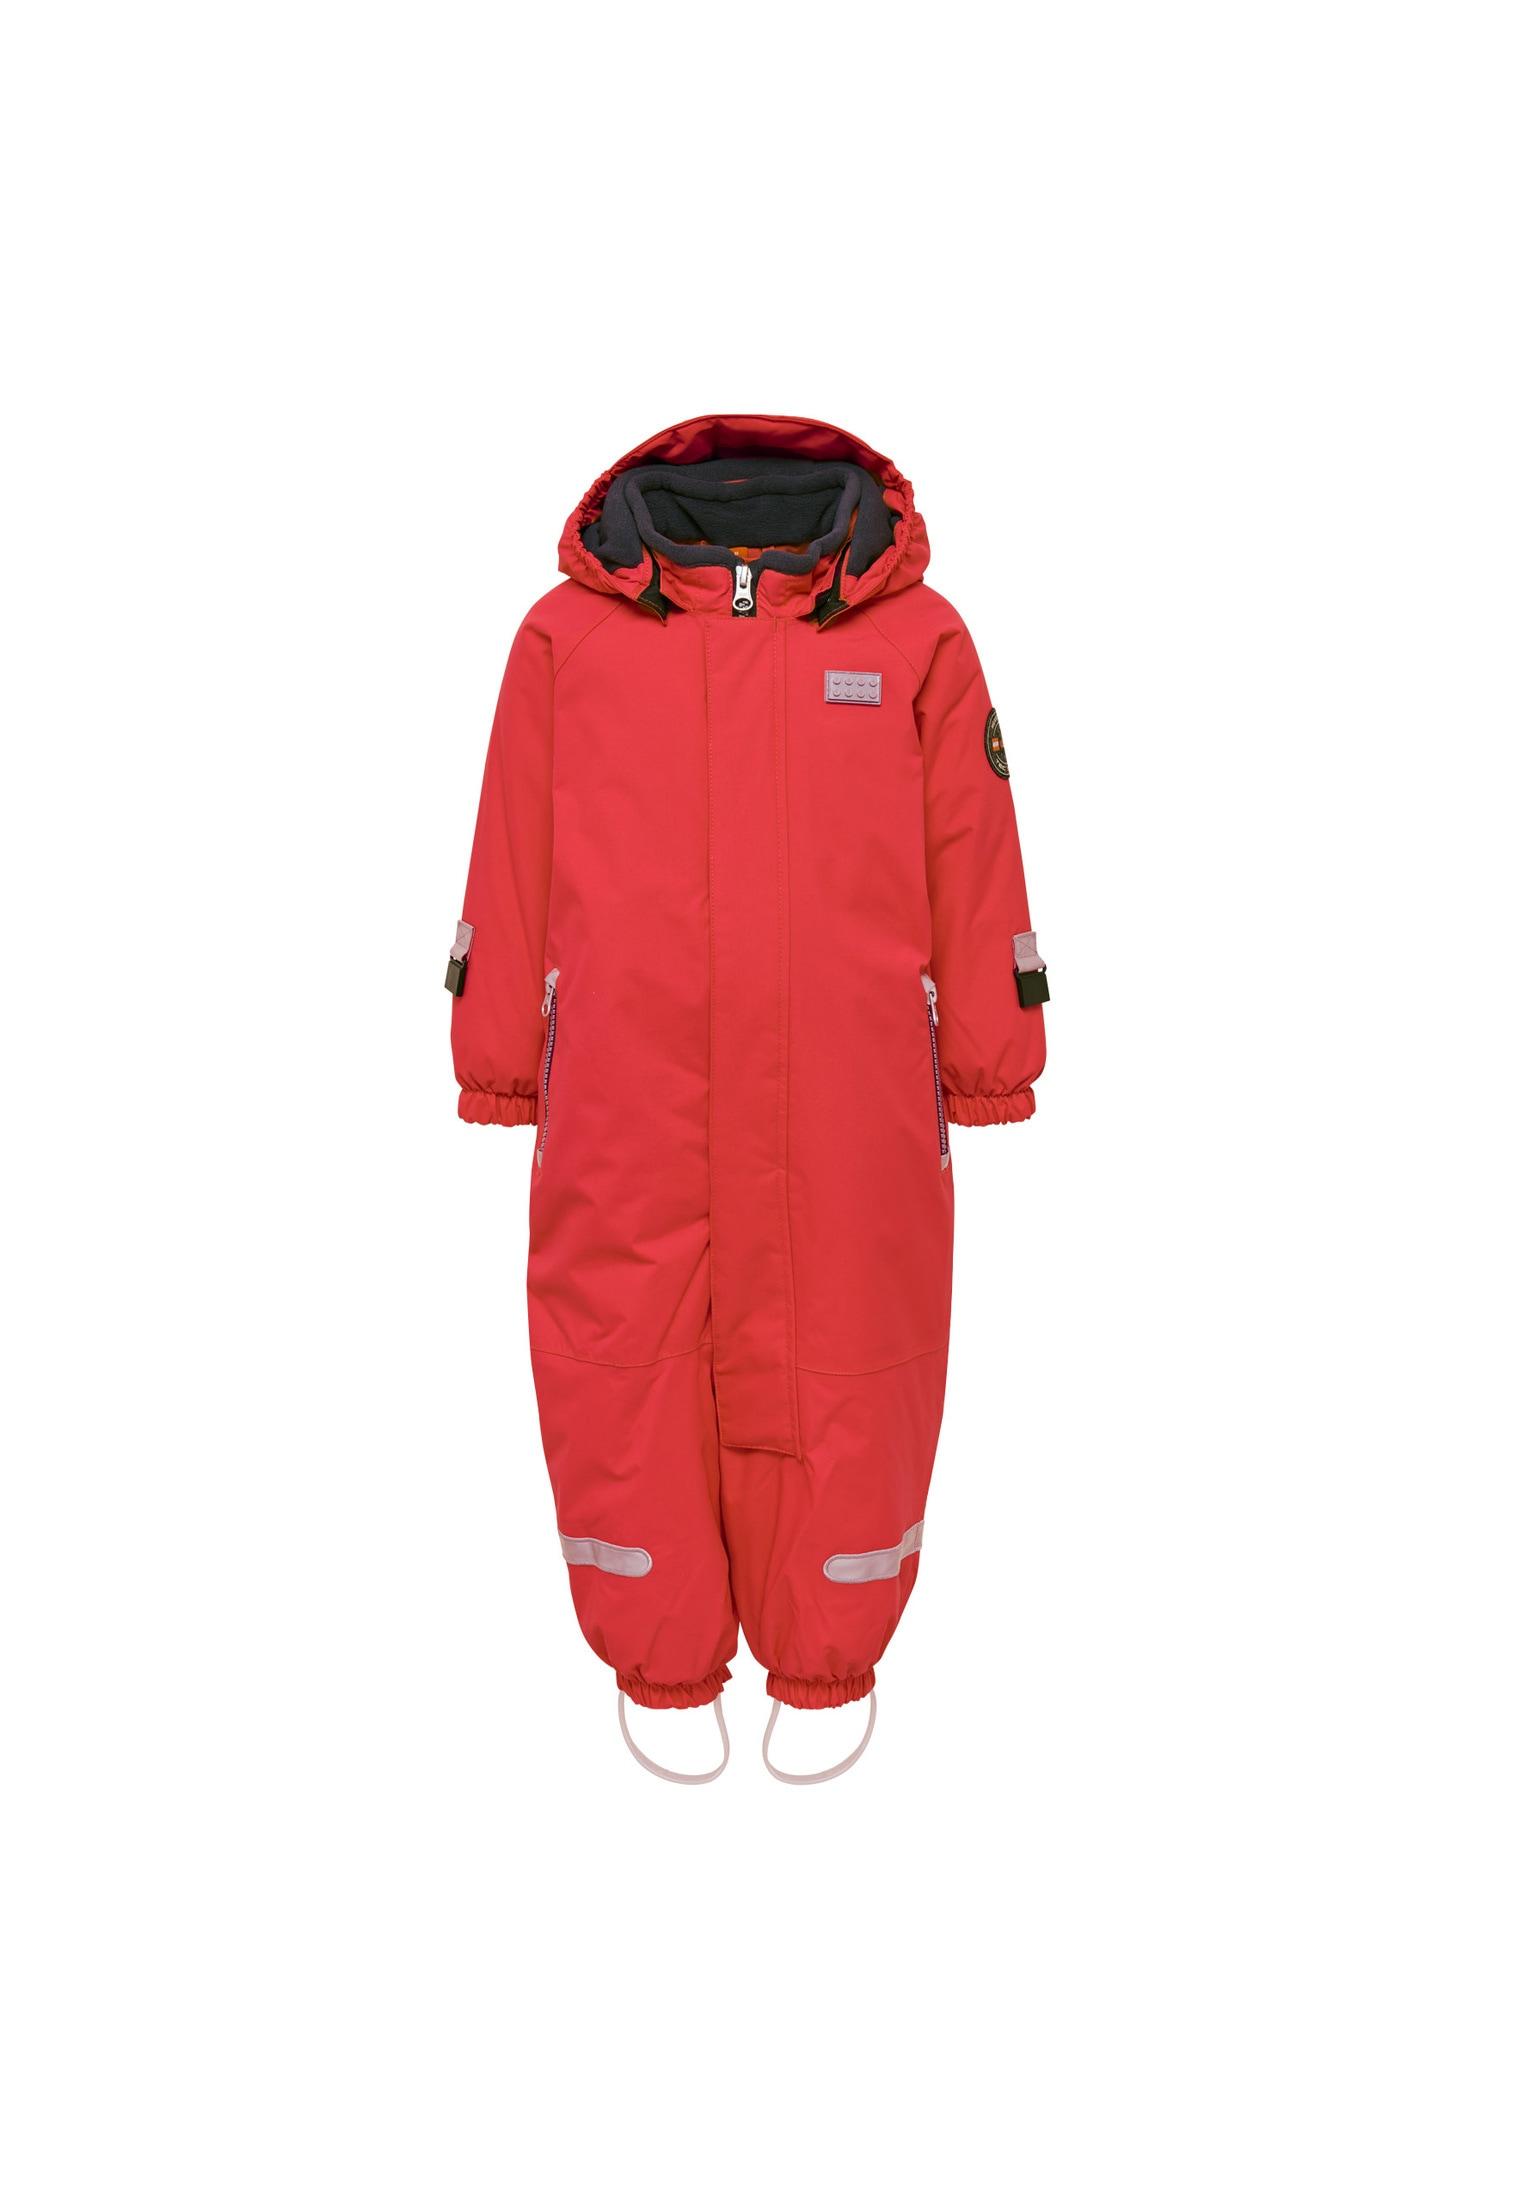 LEGO Wear Skianzug LWJULIAN 711 rot Jungen Schneeanzüge Schneebekleidung Jungenkleidung